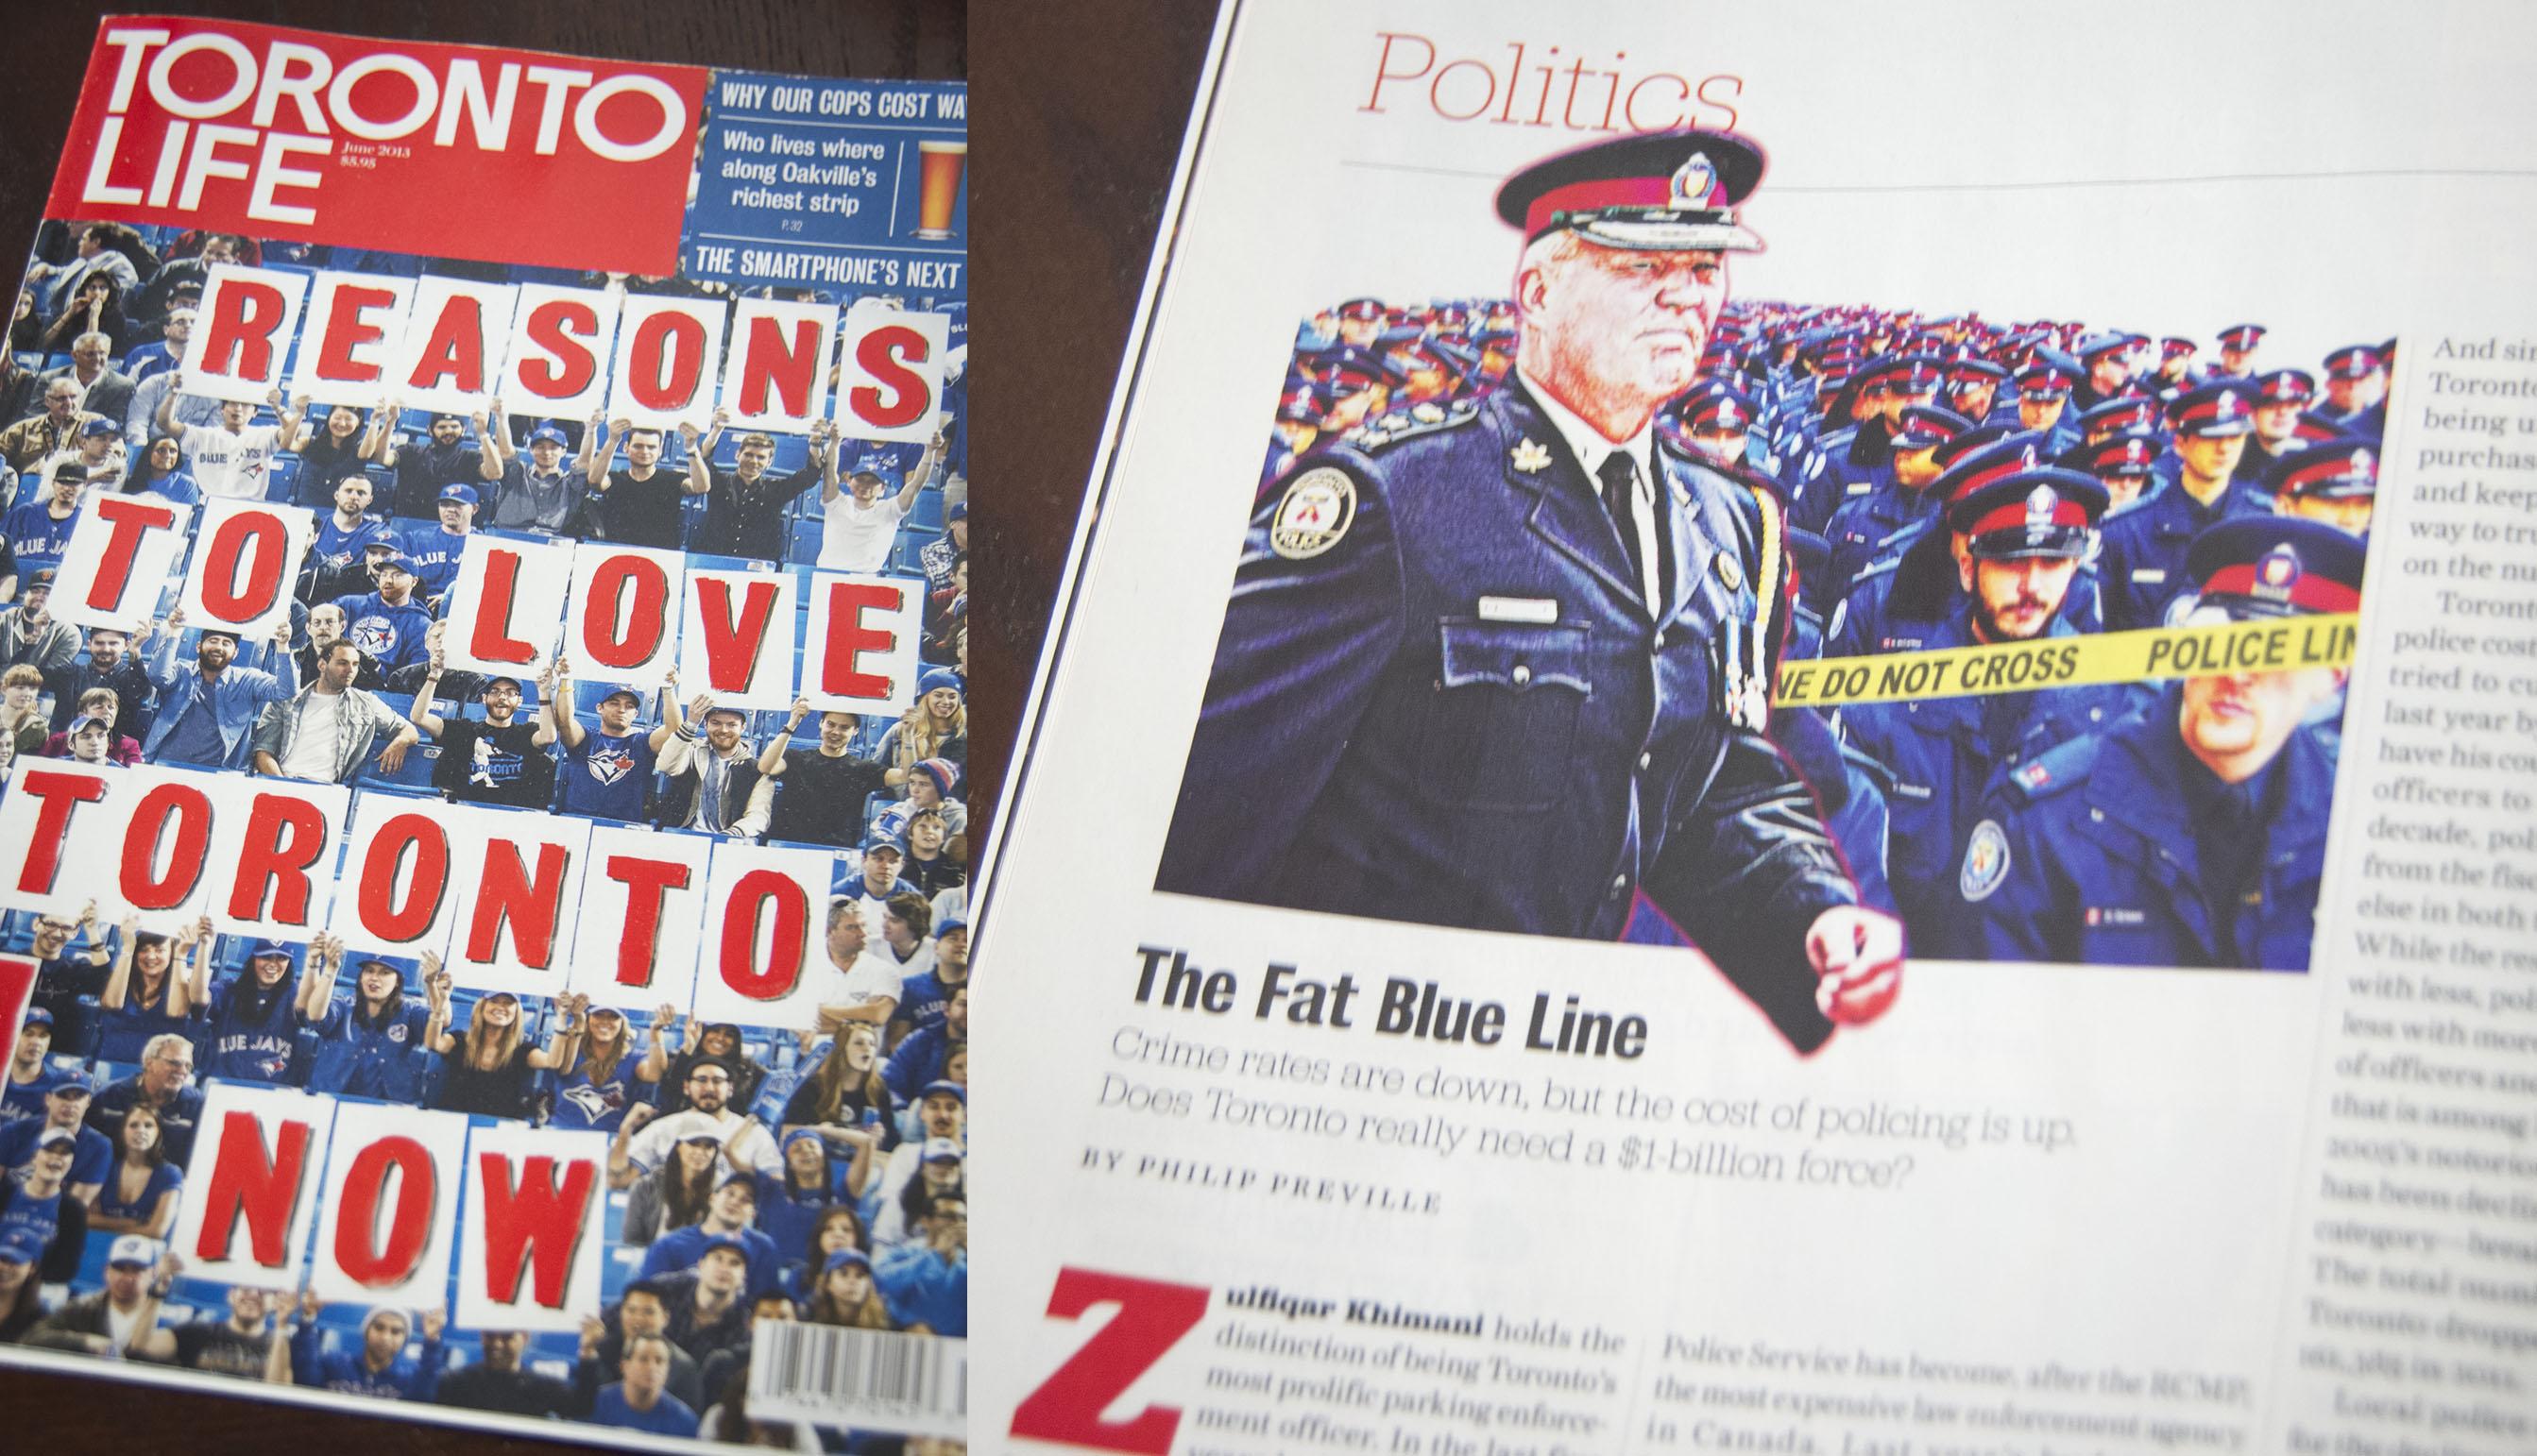 Toronto Police Chief Bill Blair Photo Published in Toronto Life Magazine